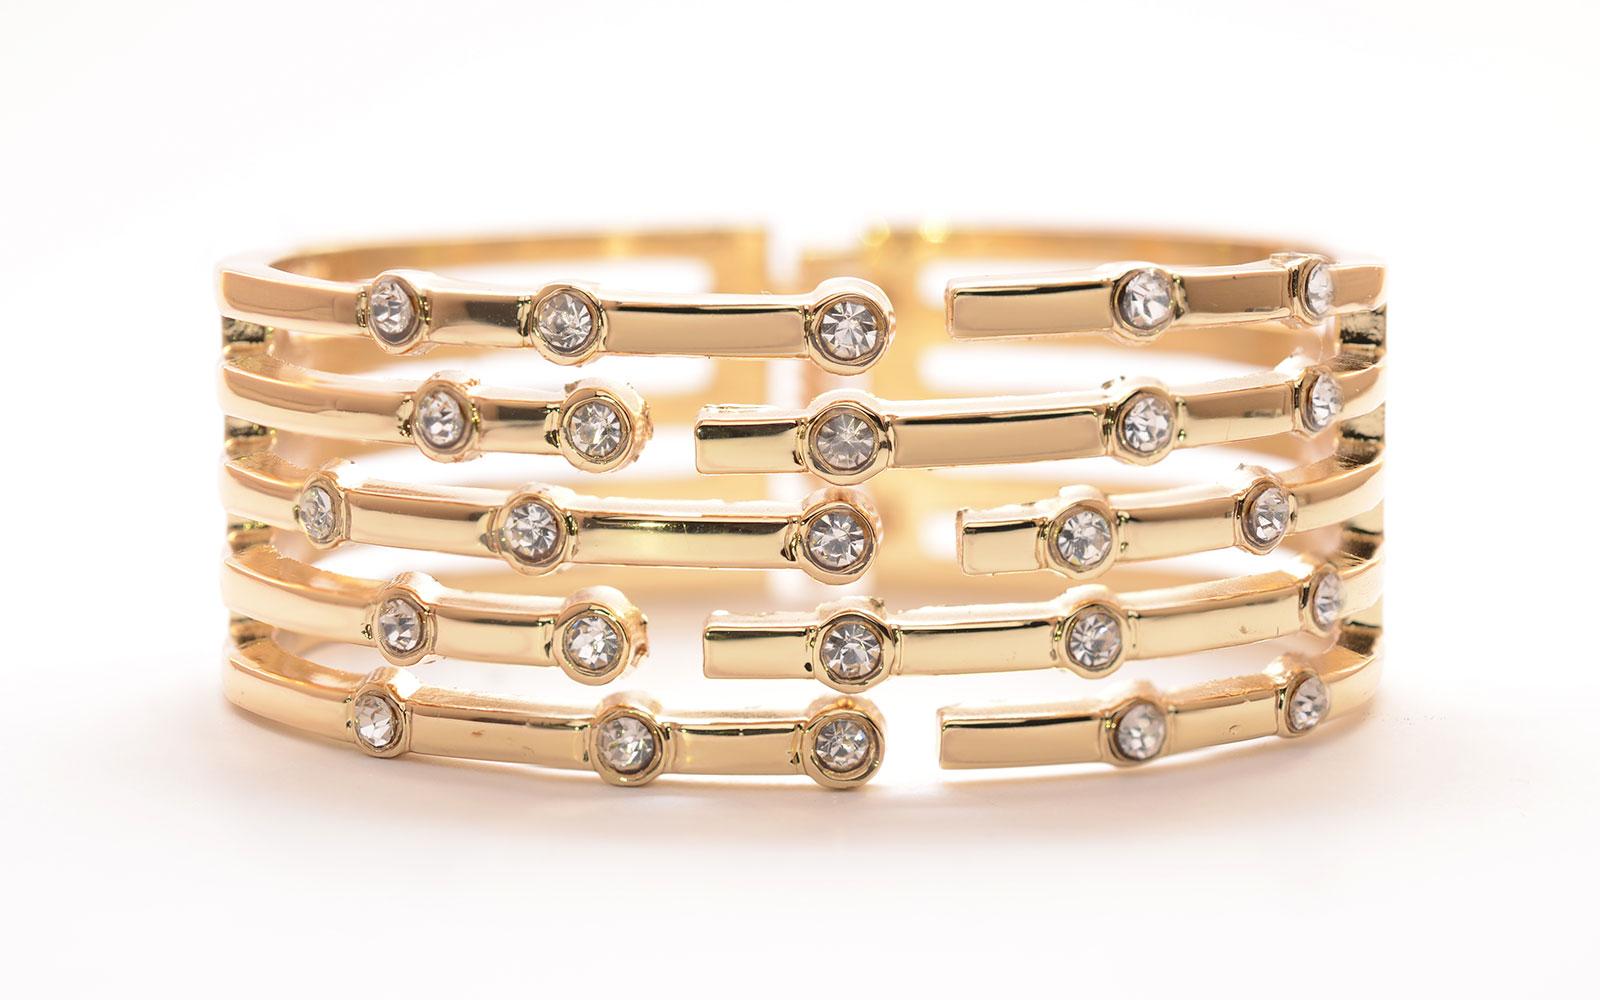 boston diamond buyers boston gold buyers and jewelry